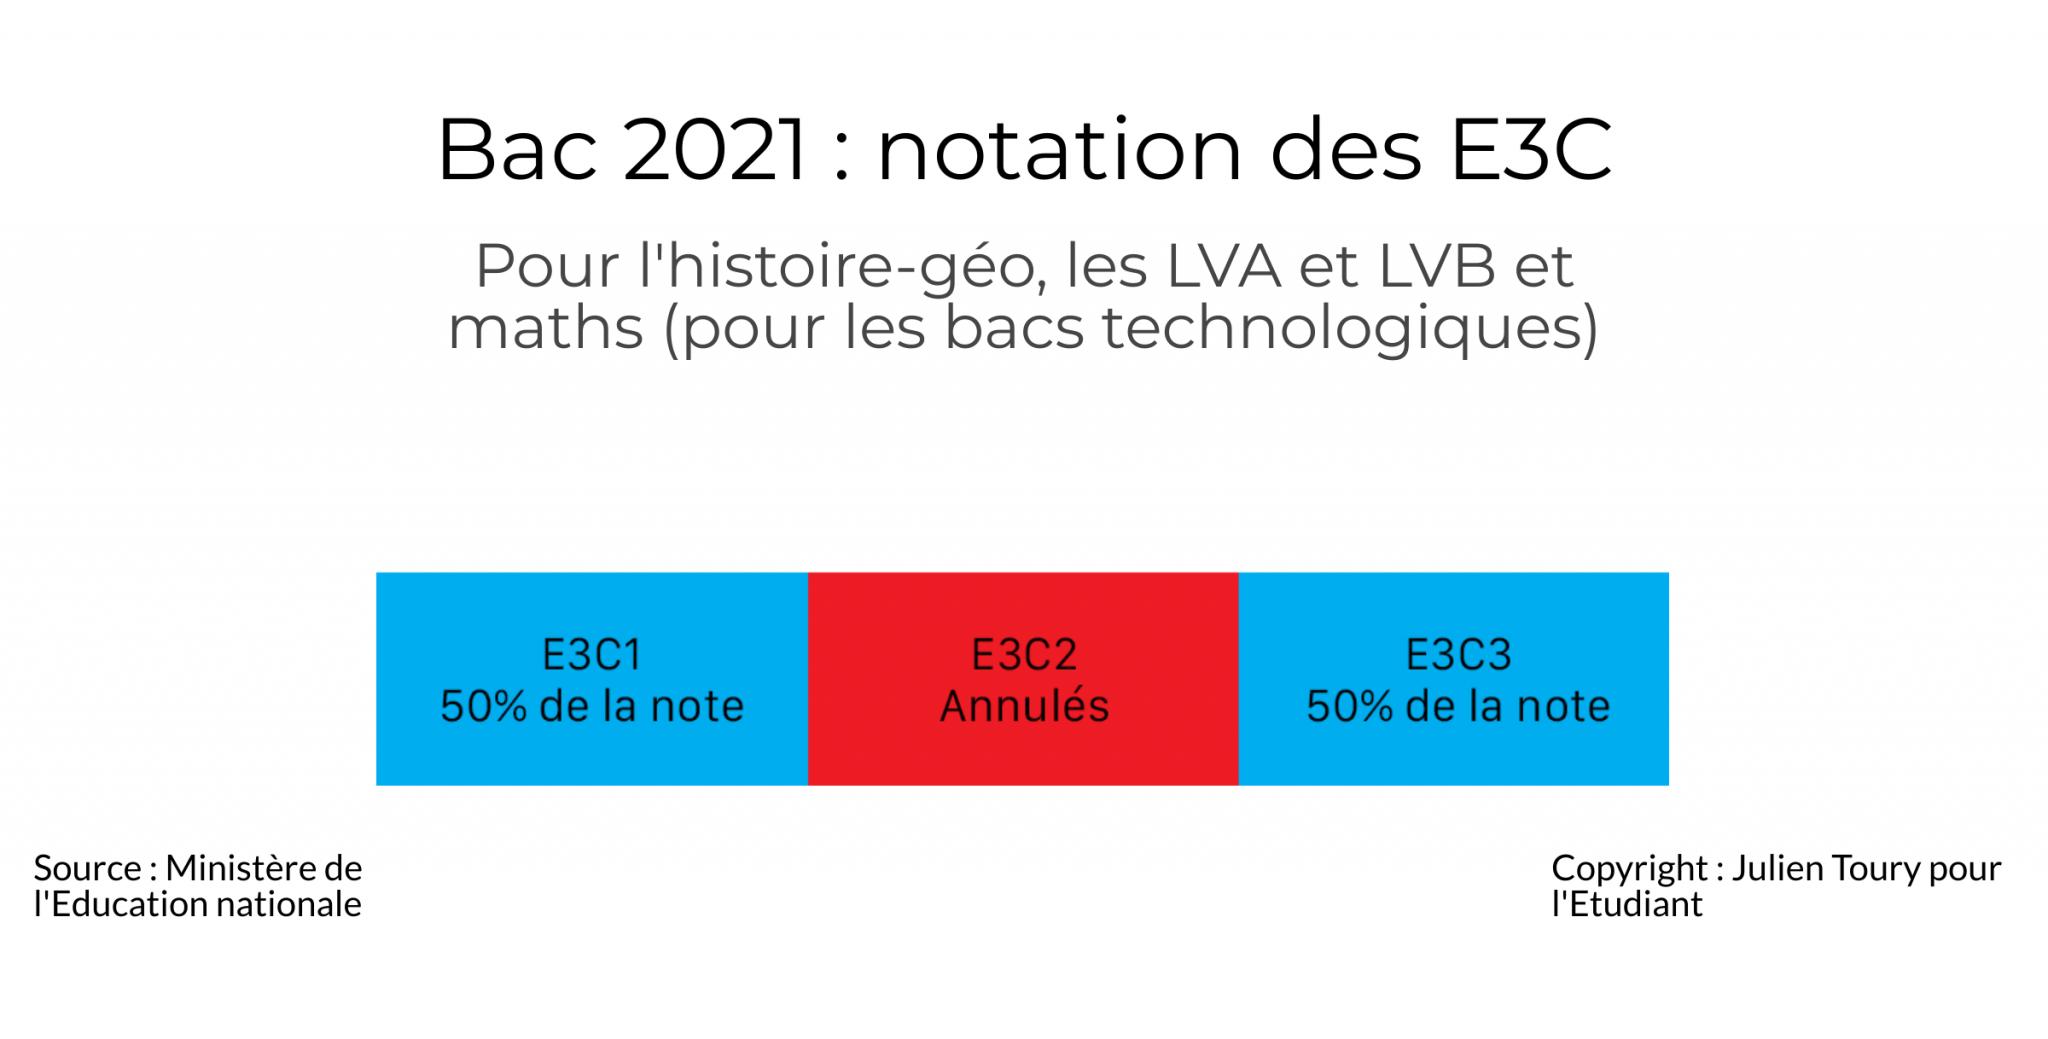 http://bo.letudiant.fr/uploads/mediatheque/ETU_ETU/8/6/2283486-005-original.png